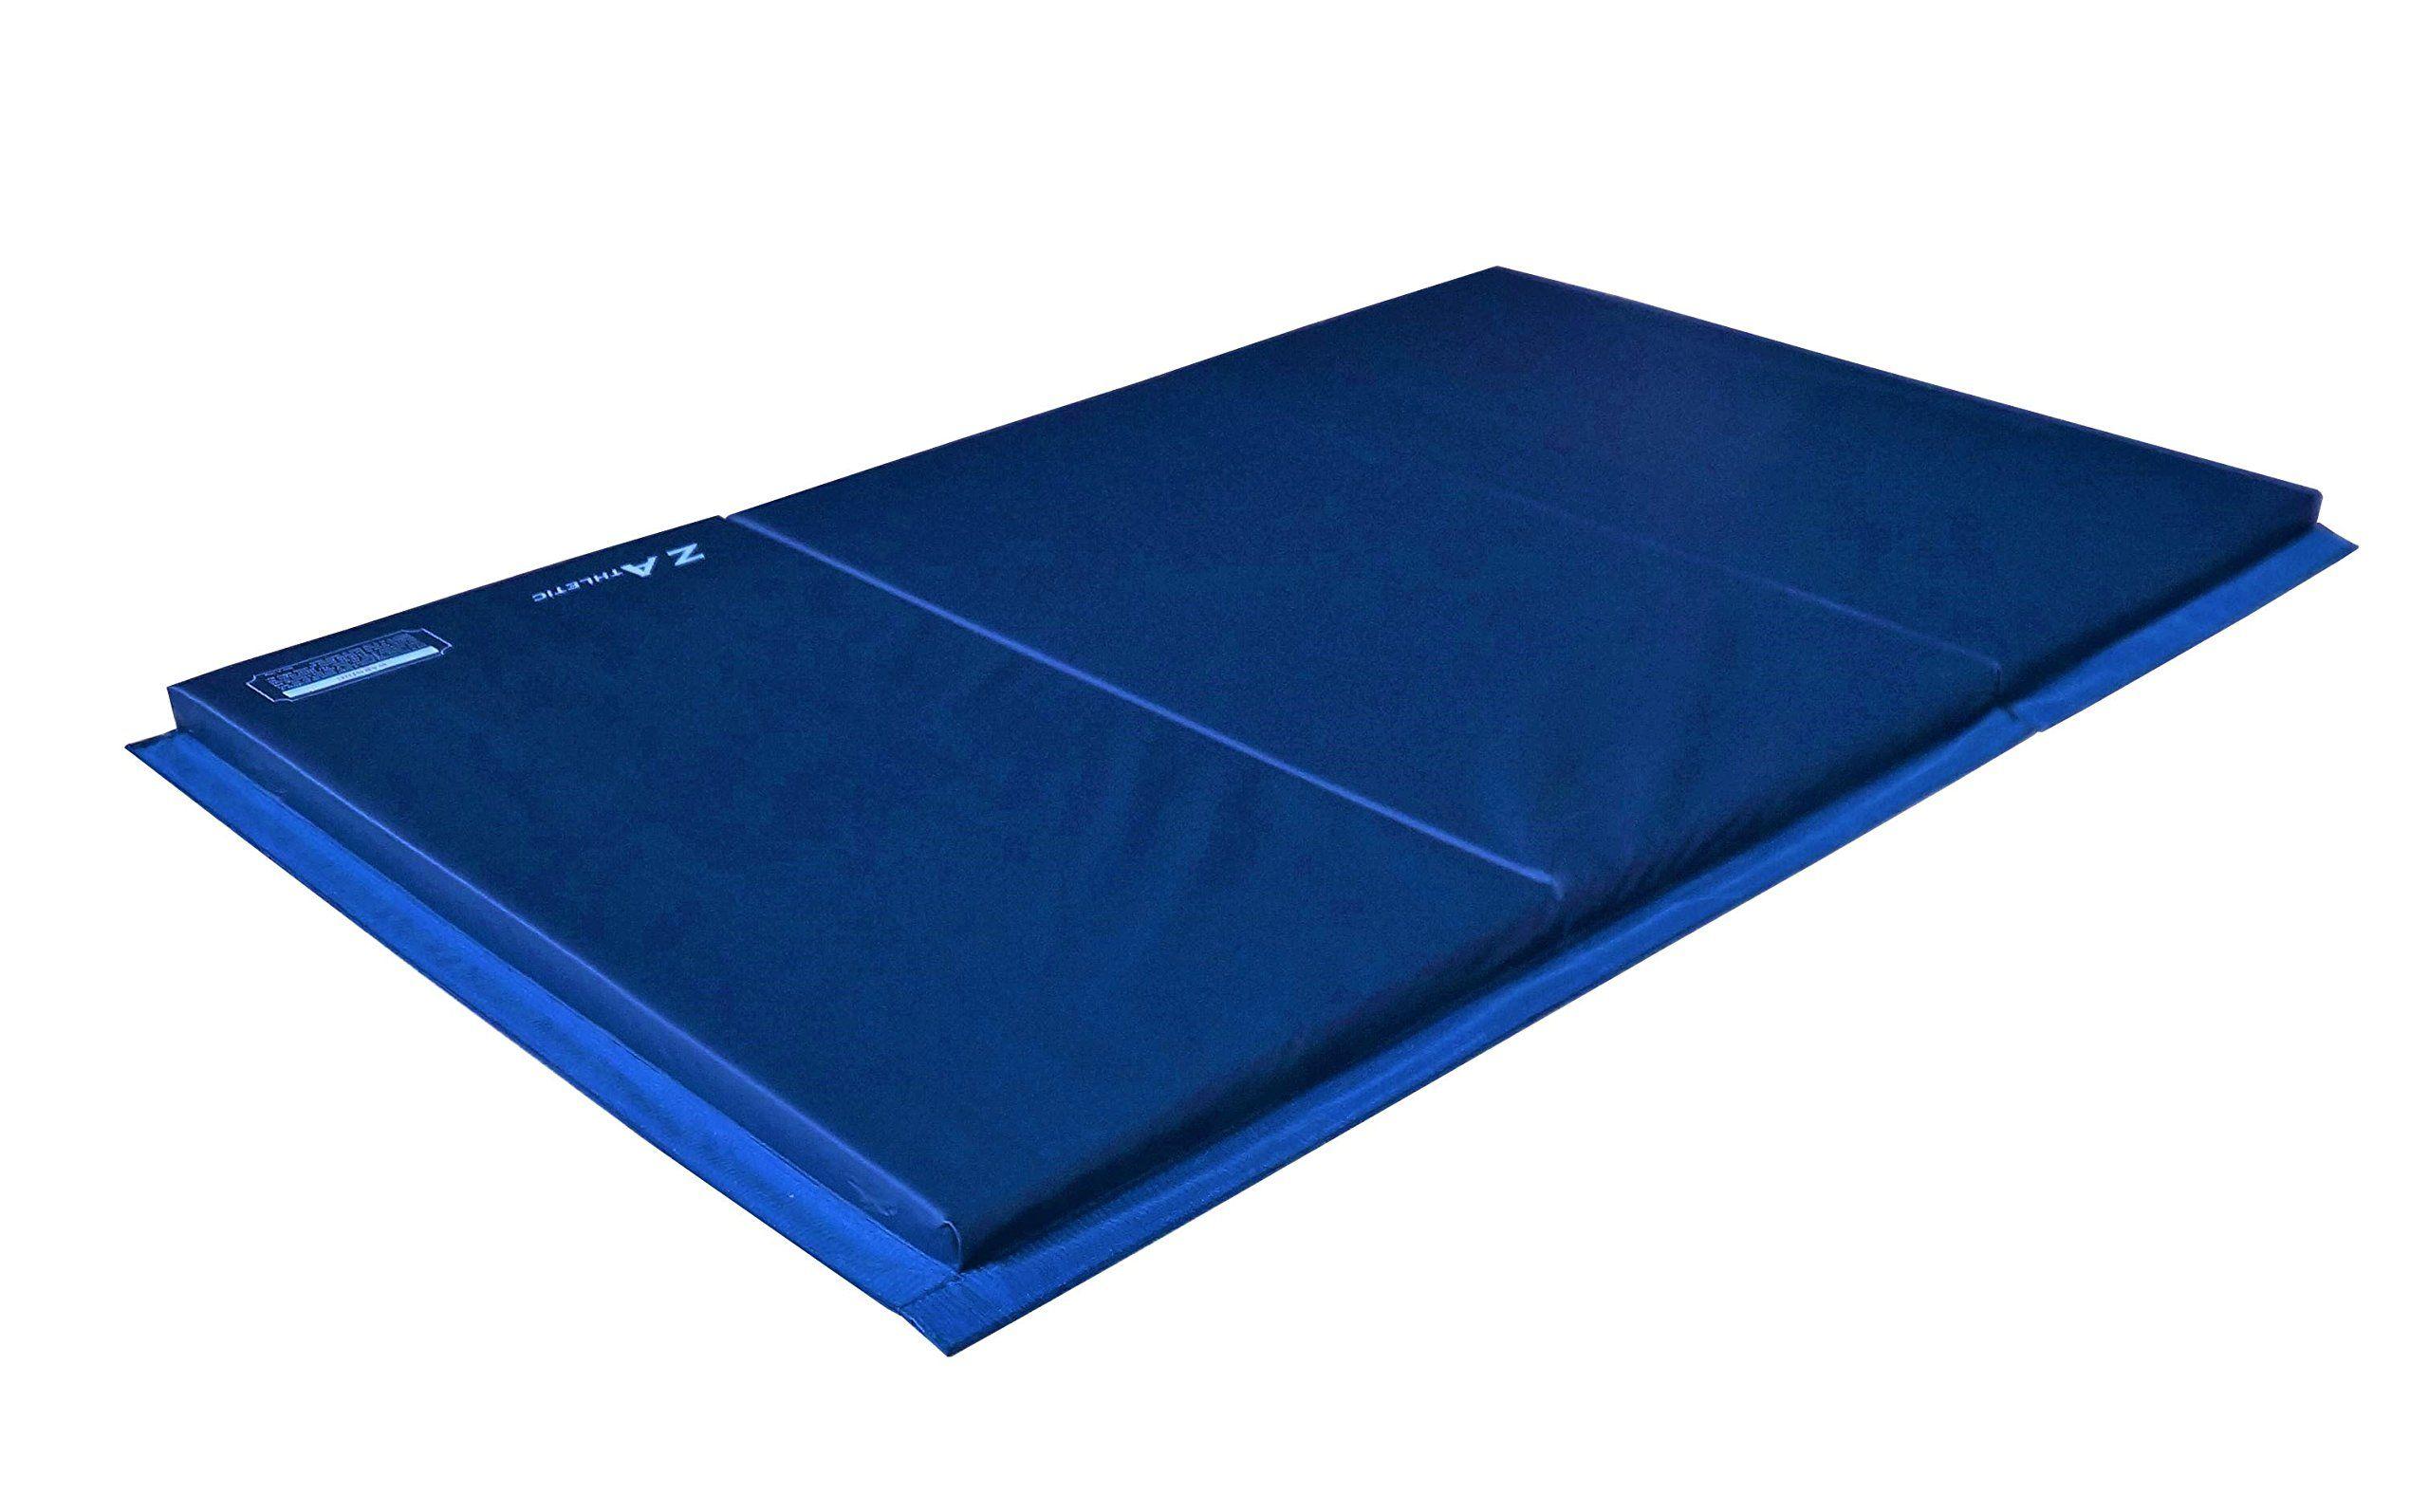 smooth vinyl x p greatmats foam oz gym mats ft mat flooring folding in purple and cover gymnastics